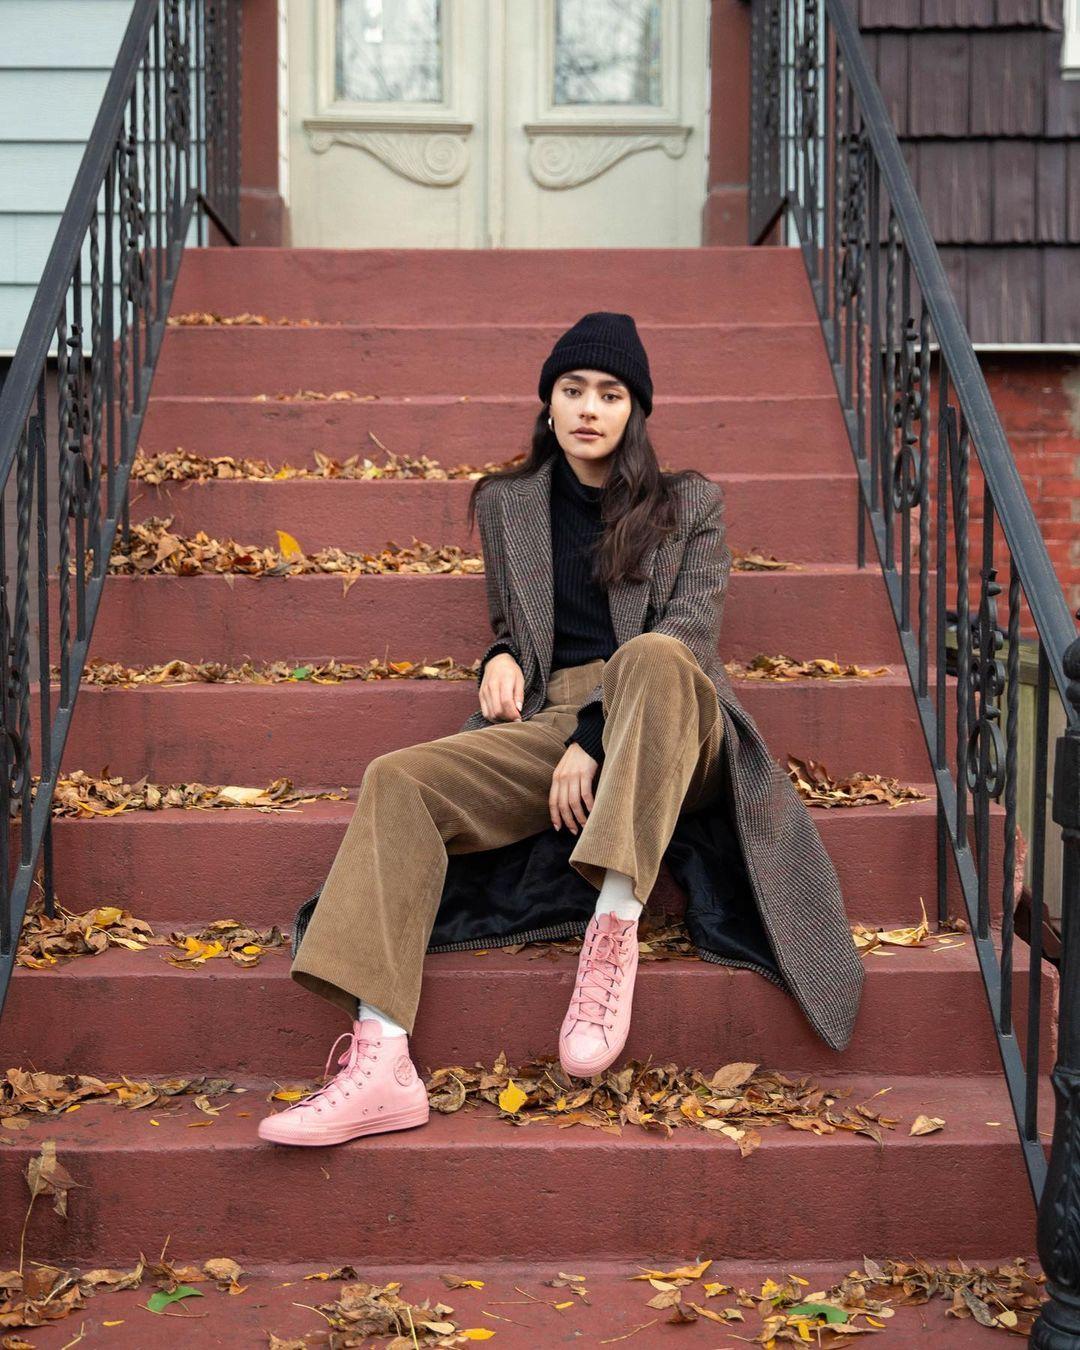 Kaitlyn-Fitzpatrick-Wallpapers-Insta-Fit-Bio-6